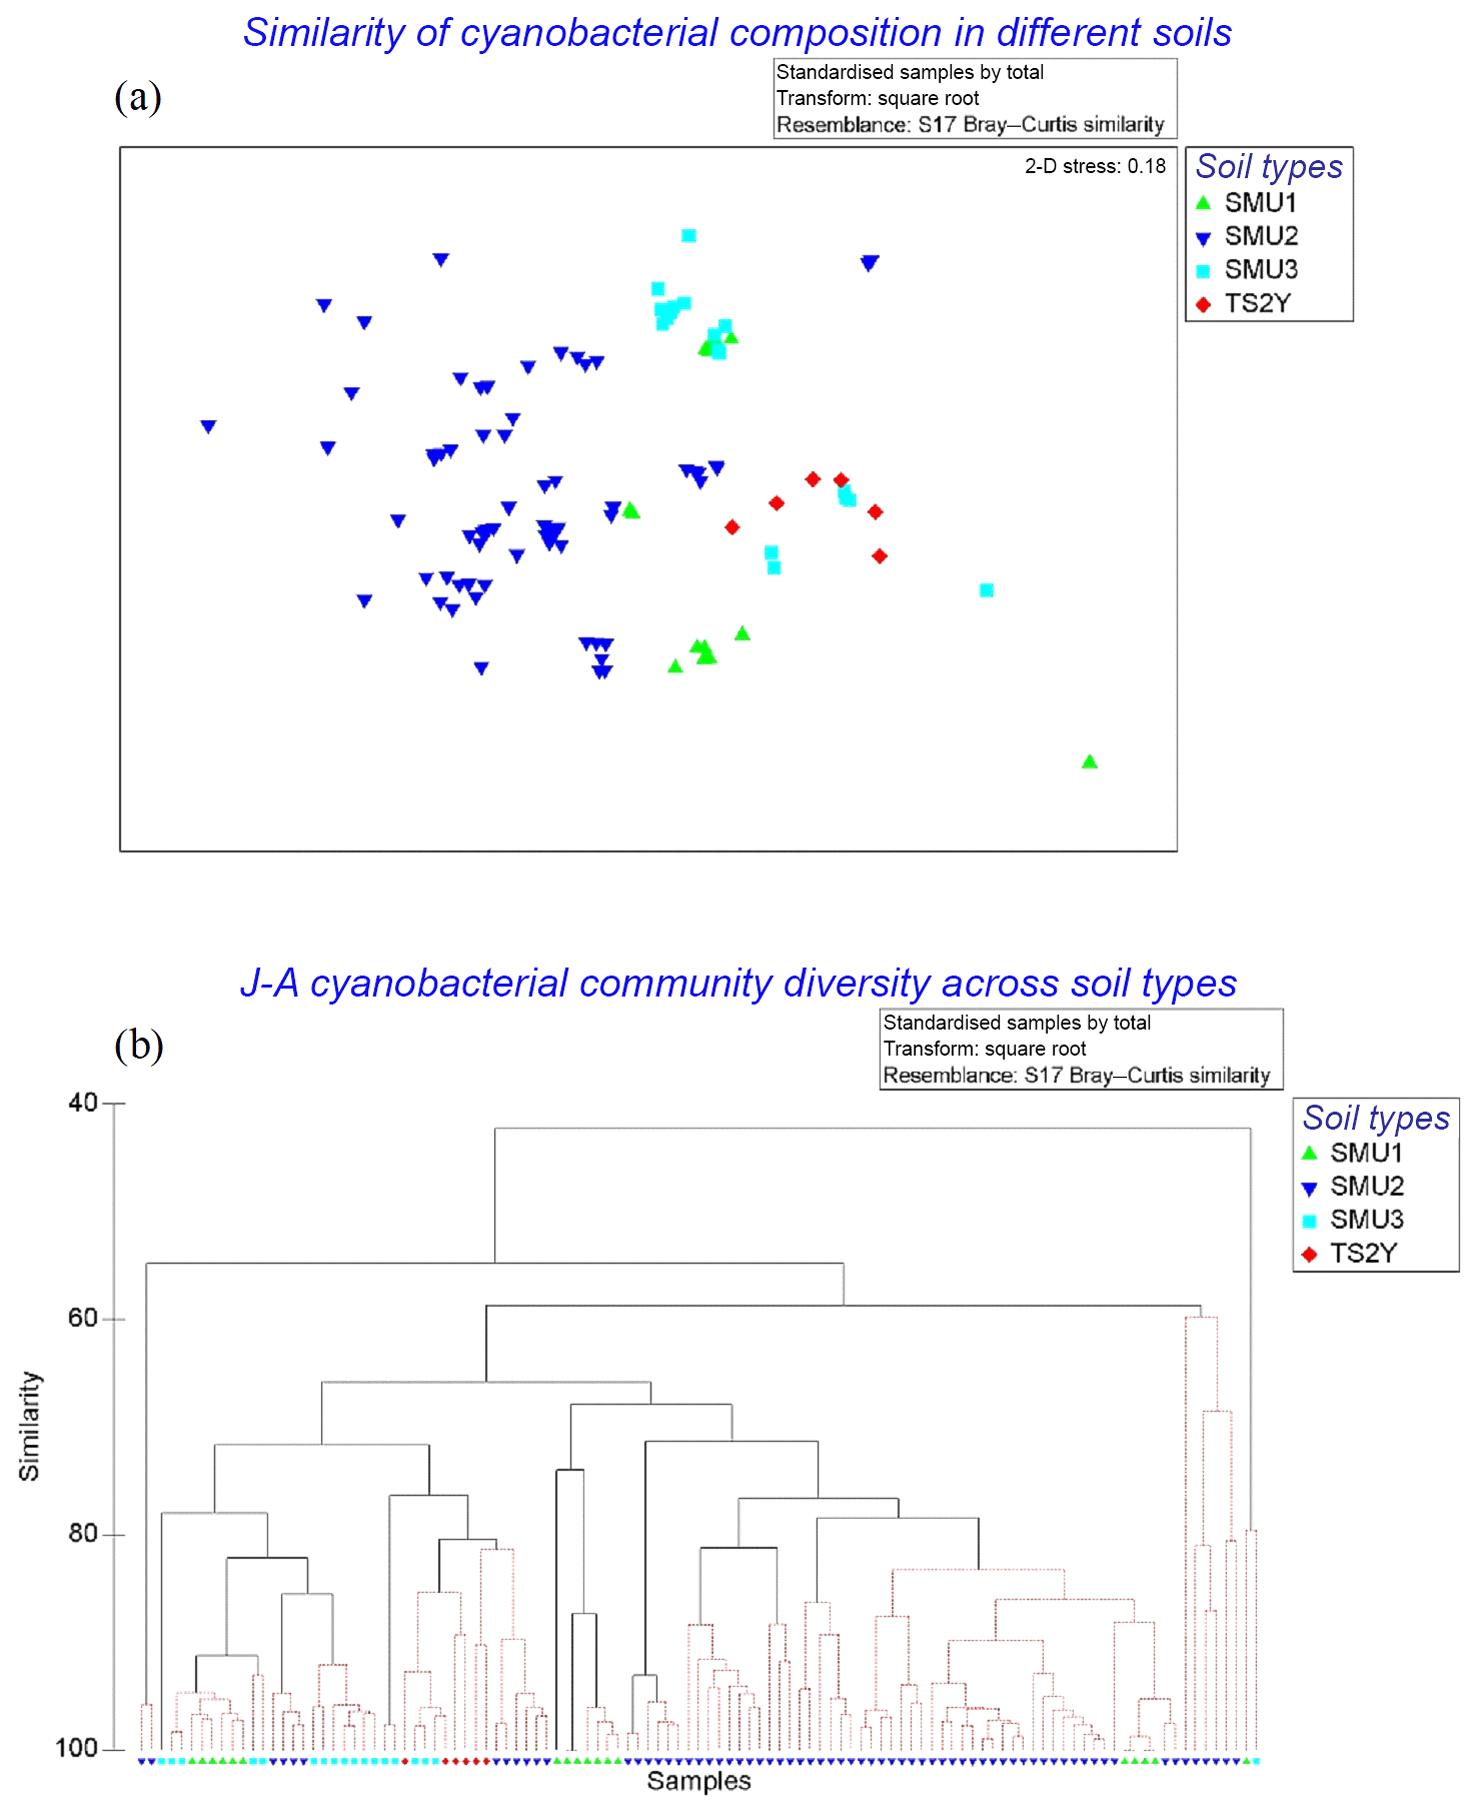 BG - Microbial biobanking – cyanobacteria-rich topsoil facilitates